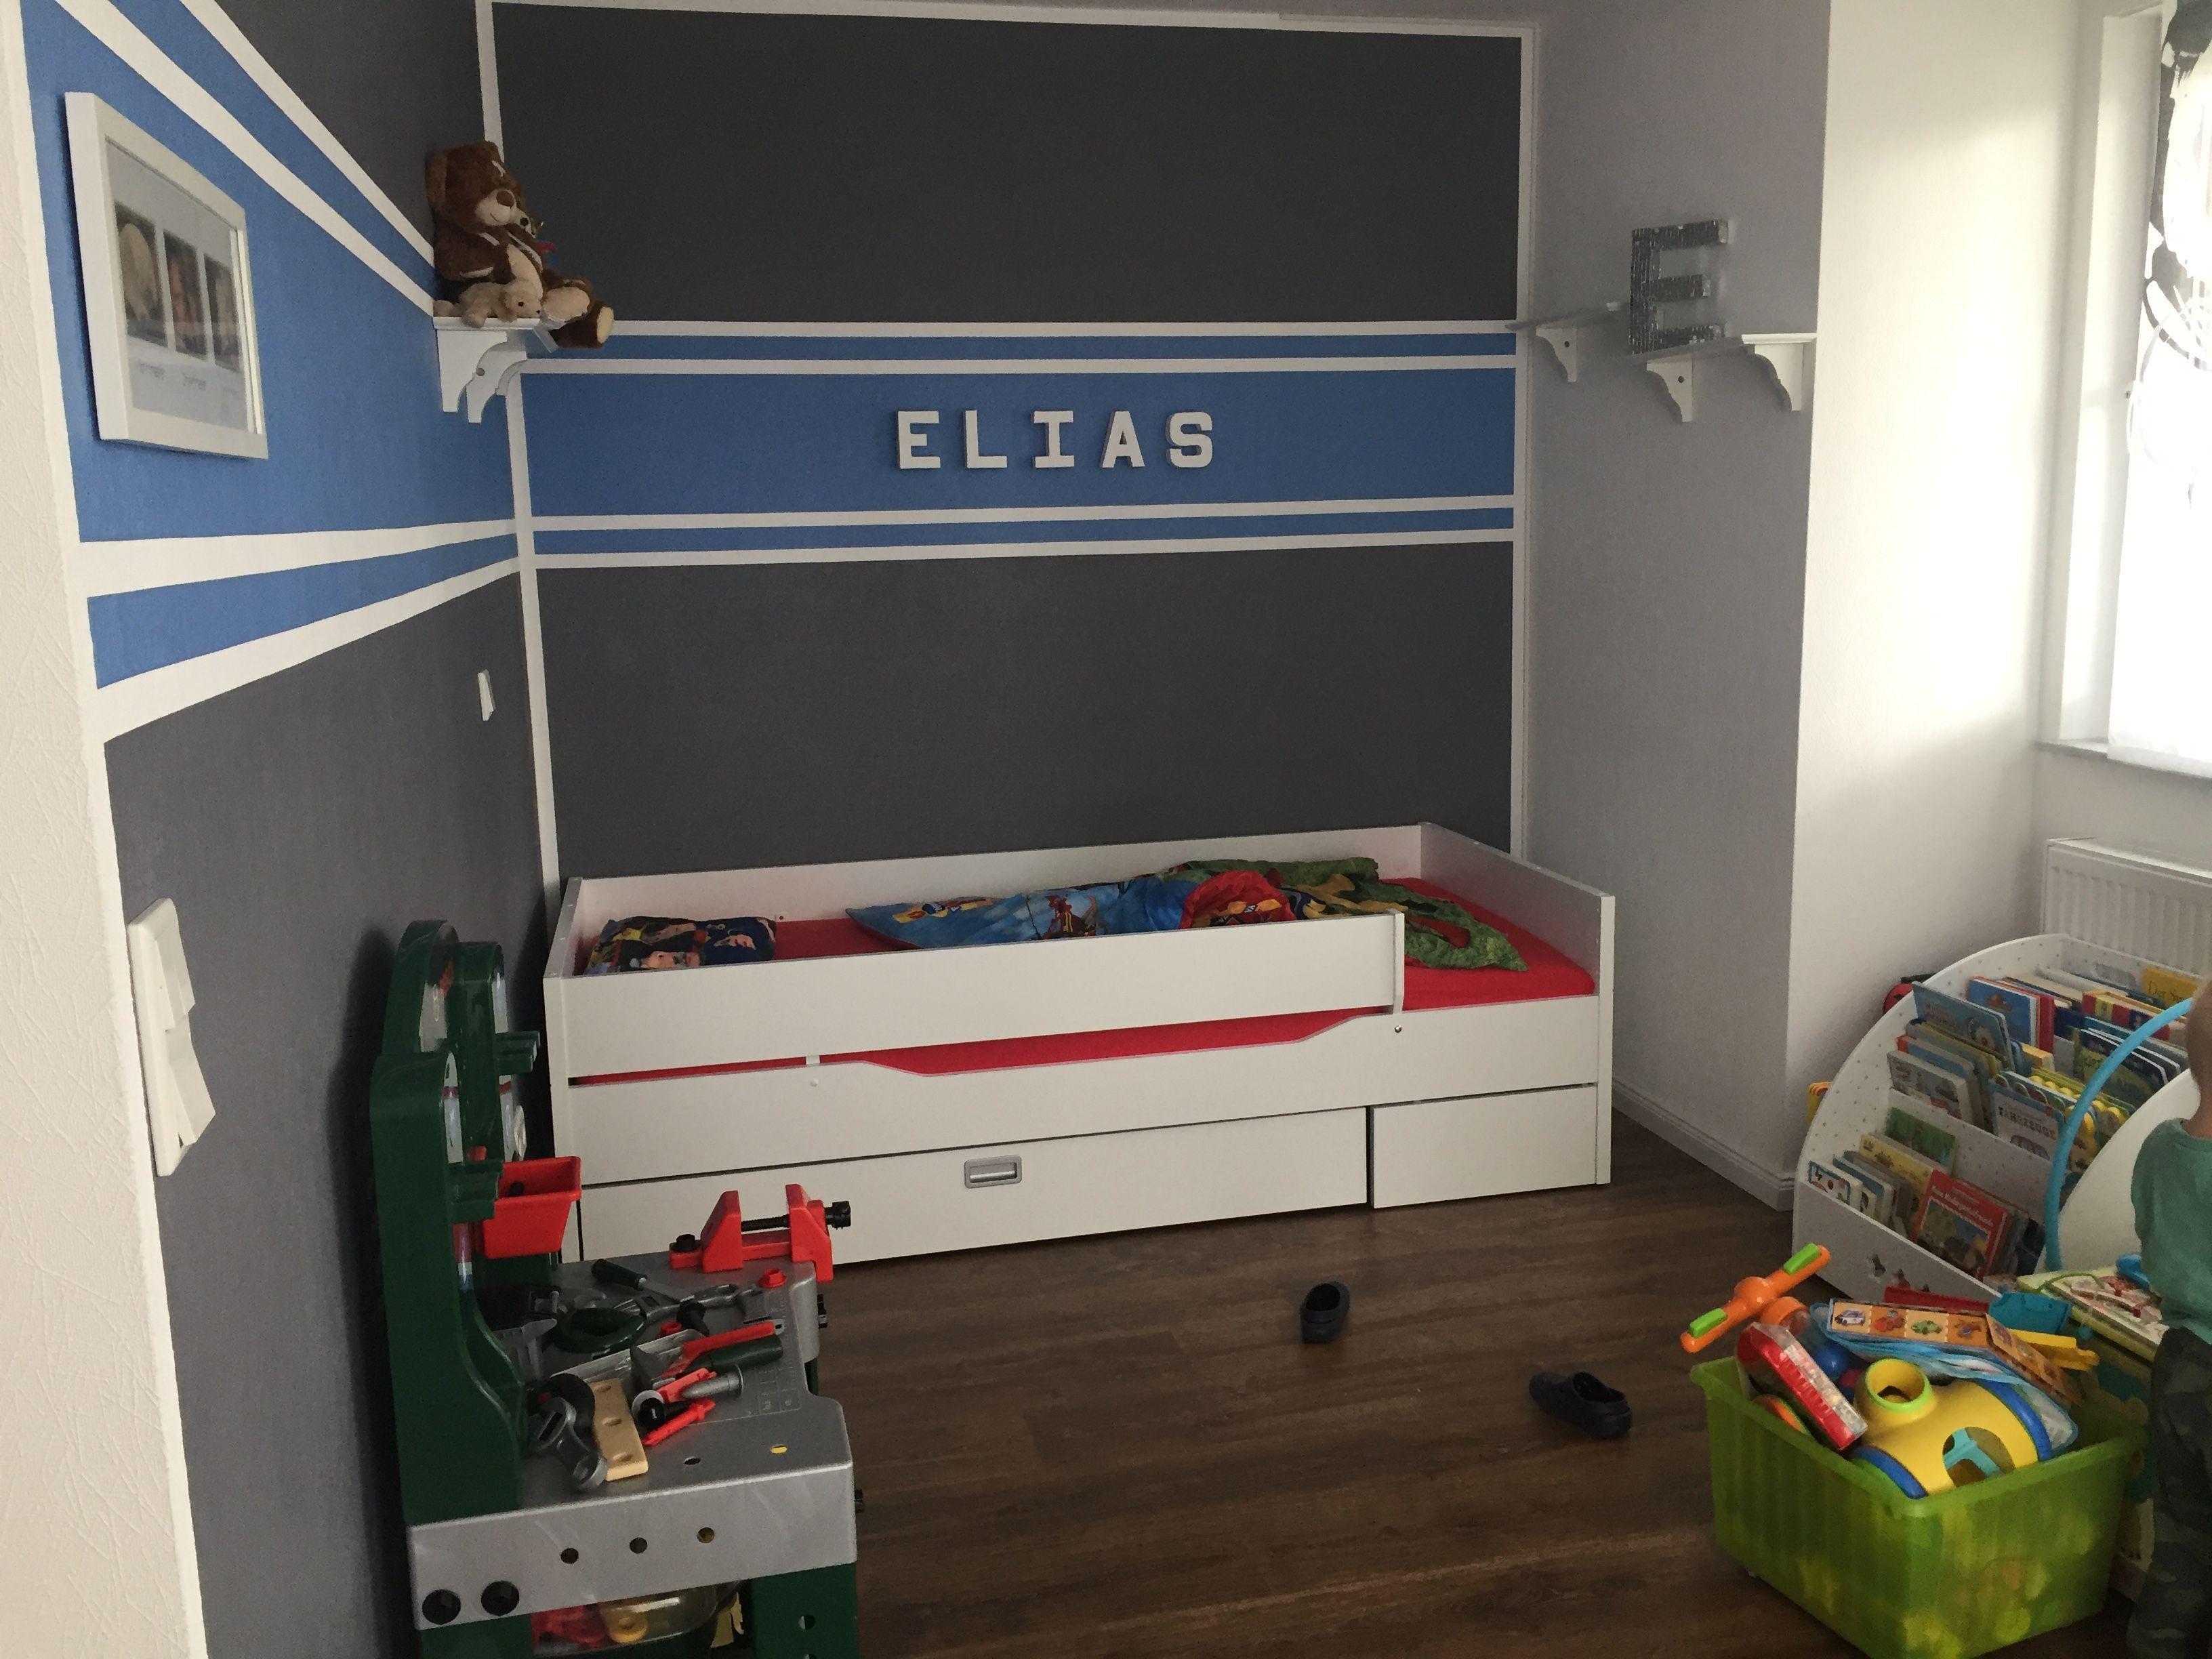 Wandfarbe Kinderzimmer Junge - Elias   Pinterest   {Wandfarbe kinderzimmer junge 23}